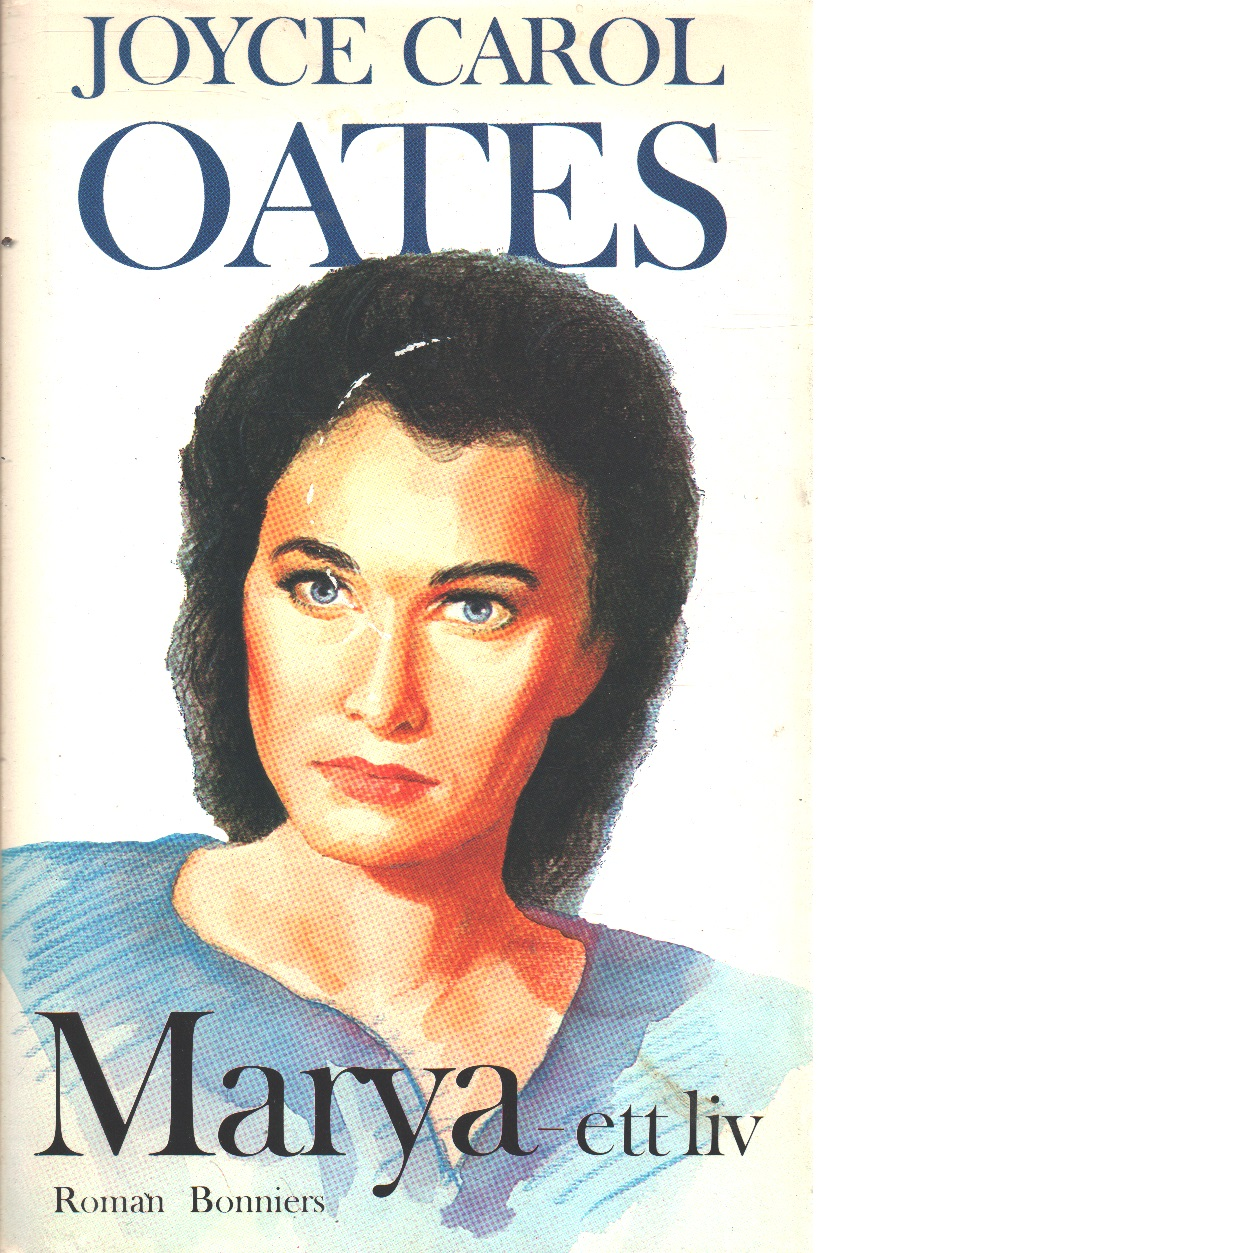 Marya : ett liv - Oates, Joyce Carol